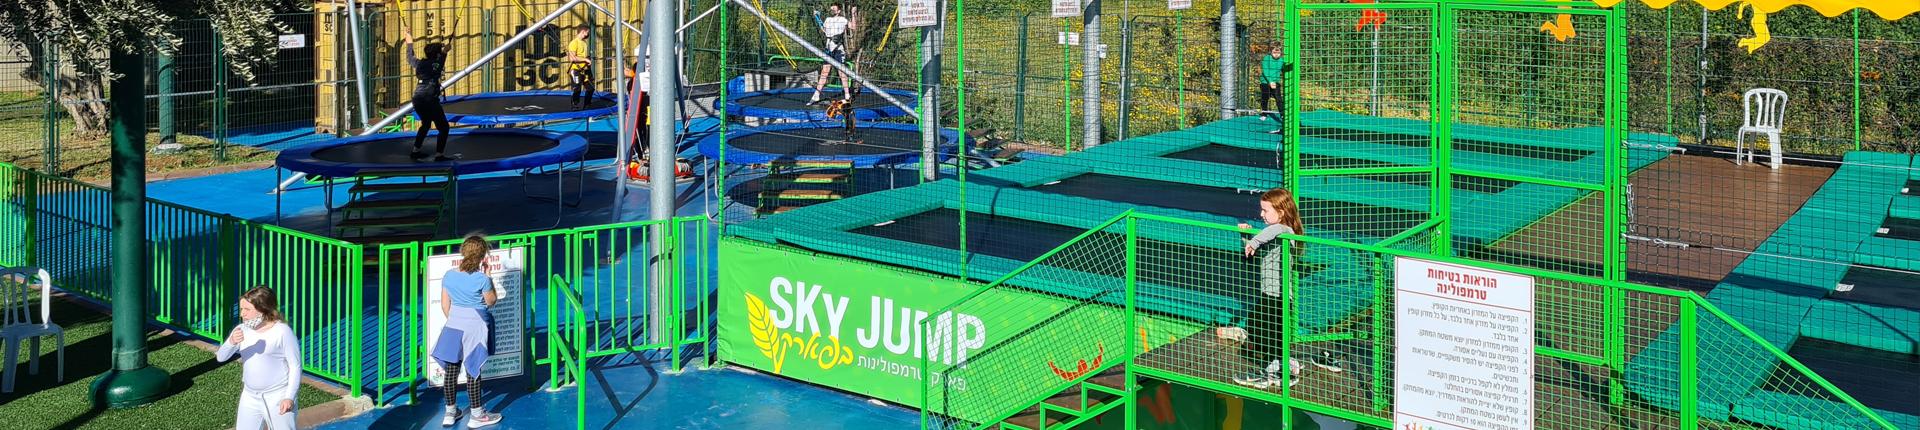 sky_jump_main_raanana